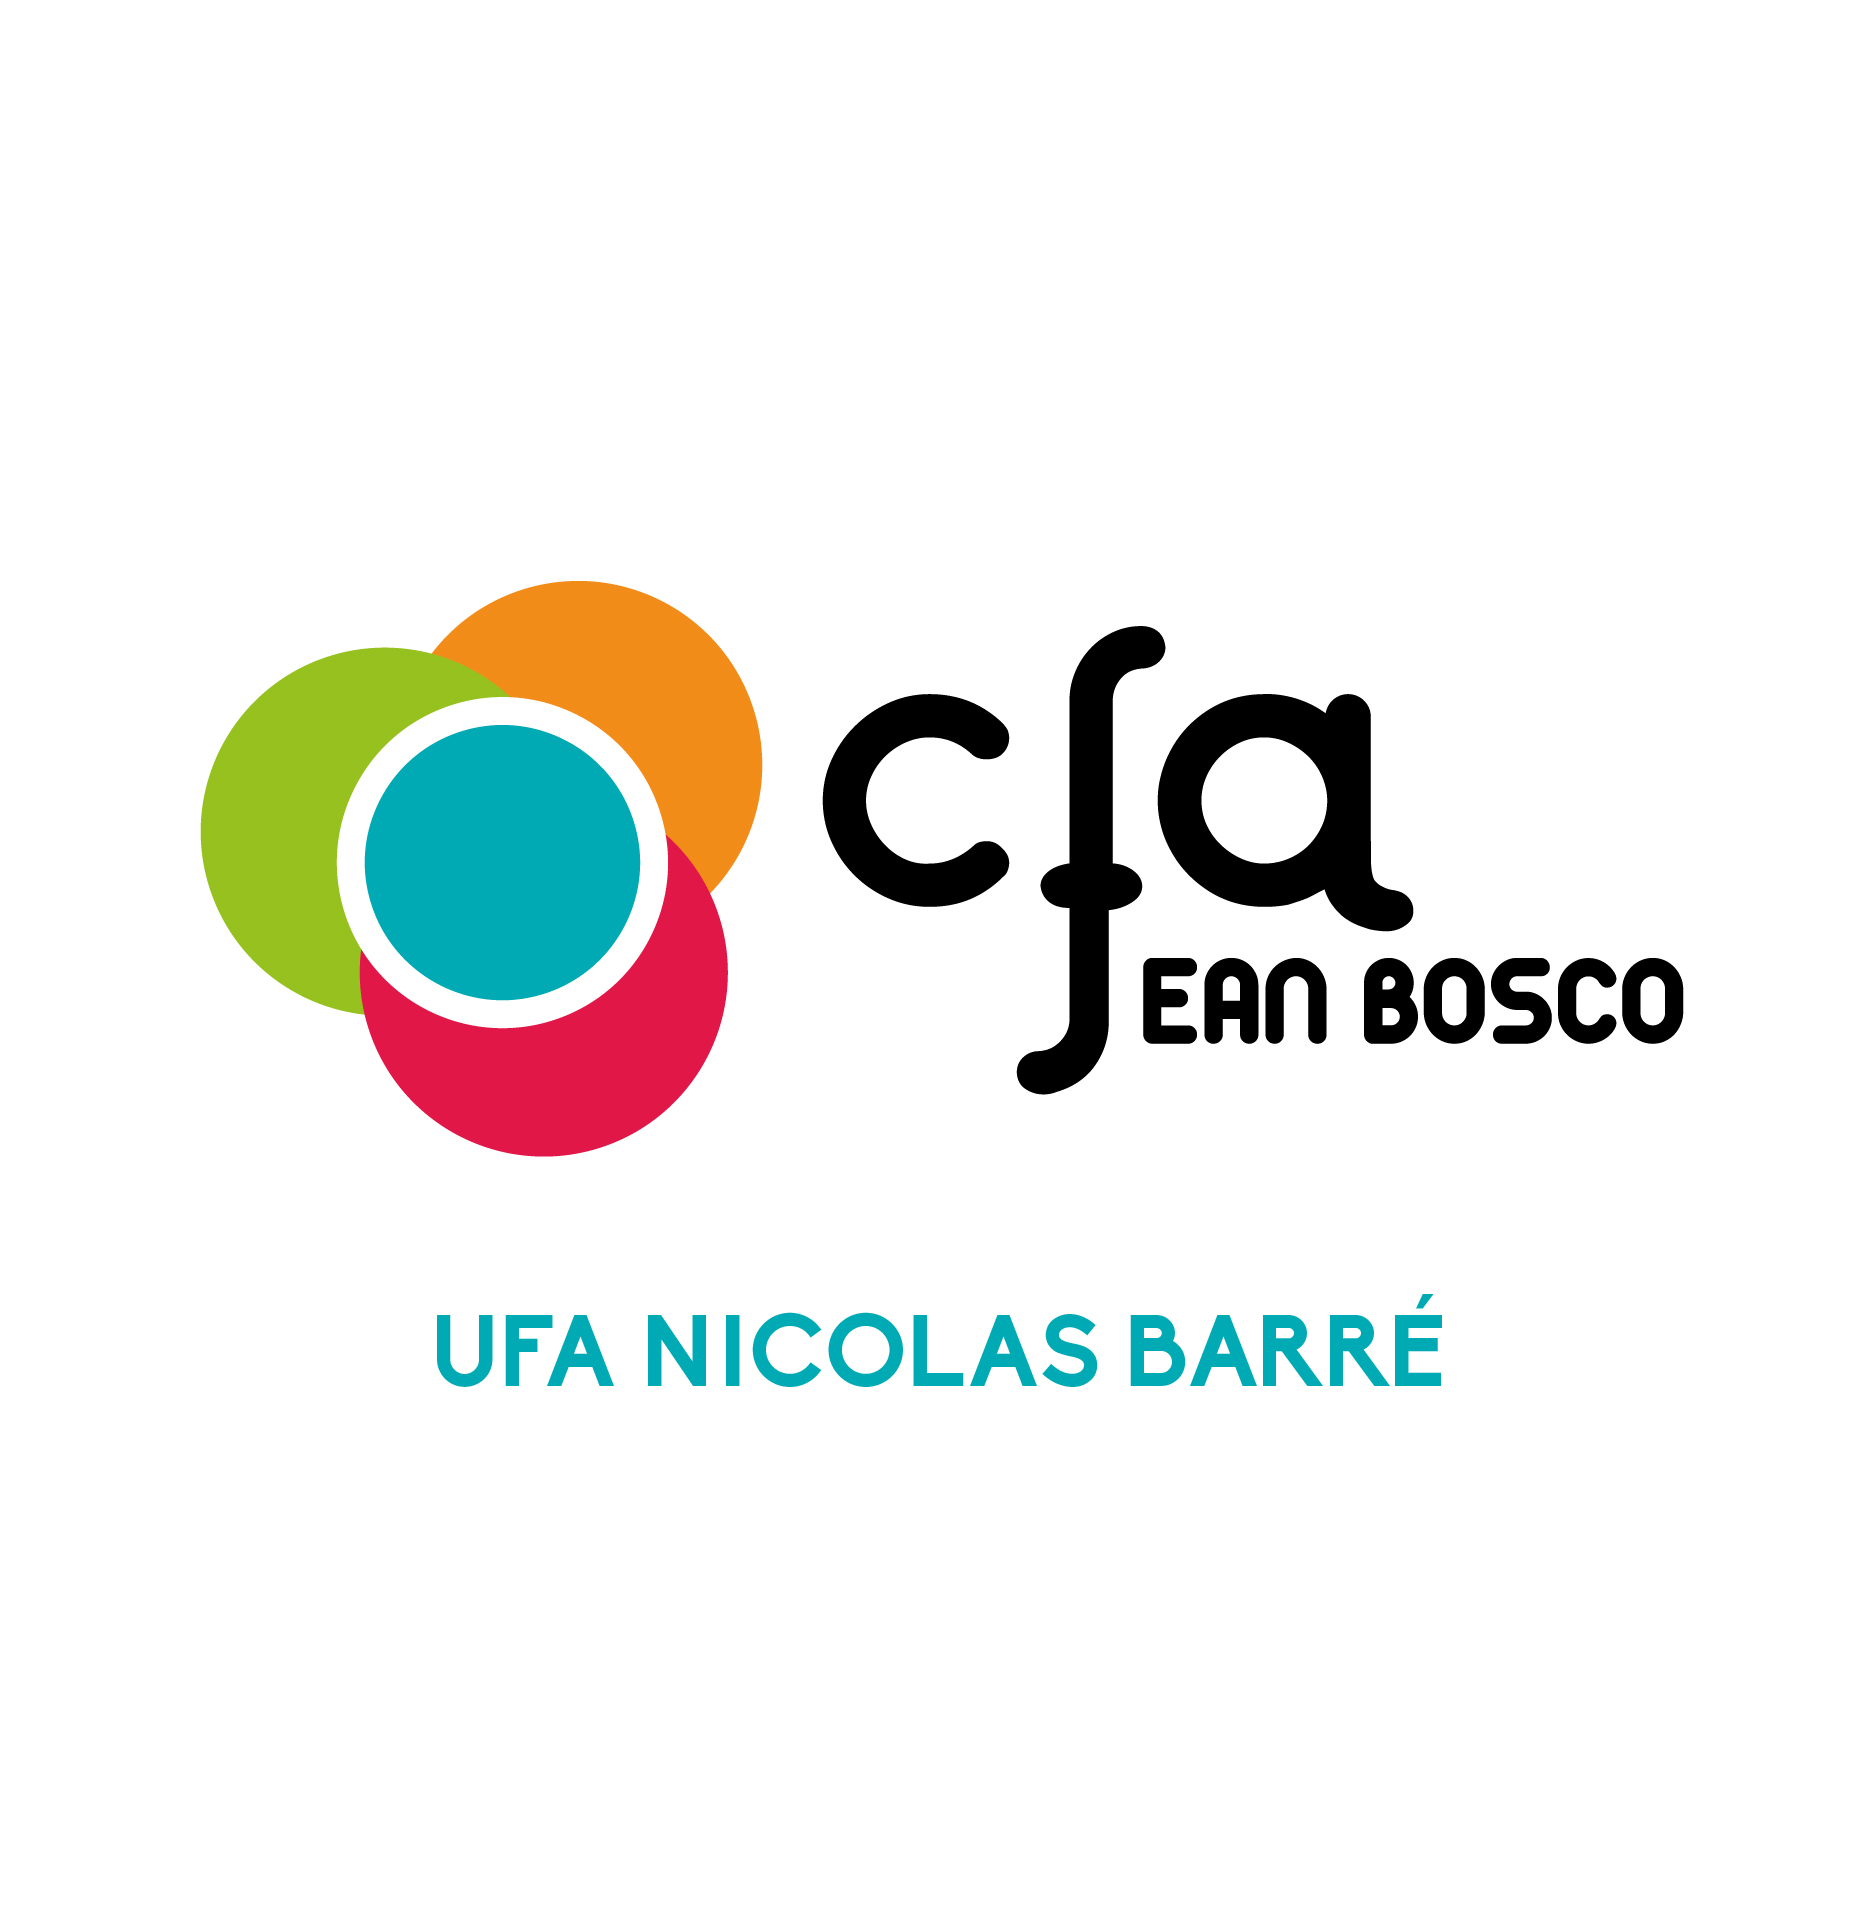 UFA NICOLAS BARRE